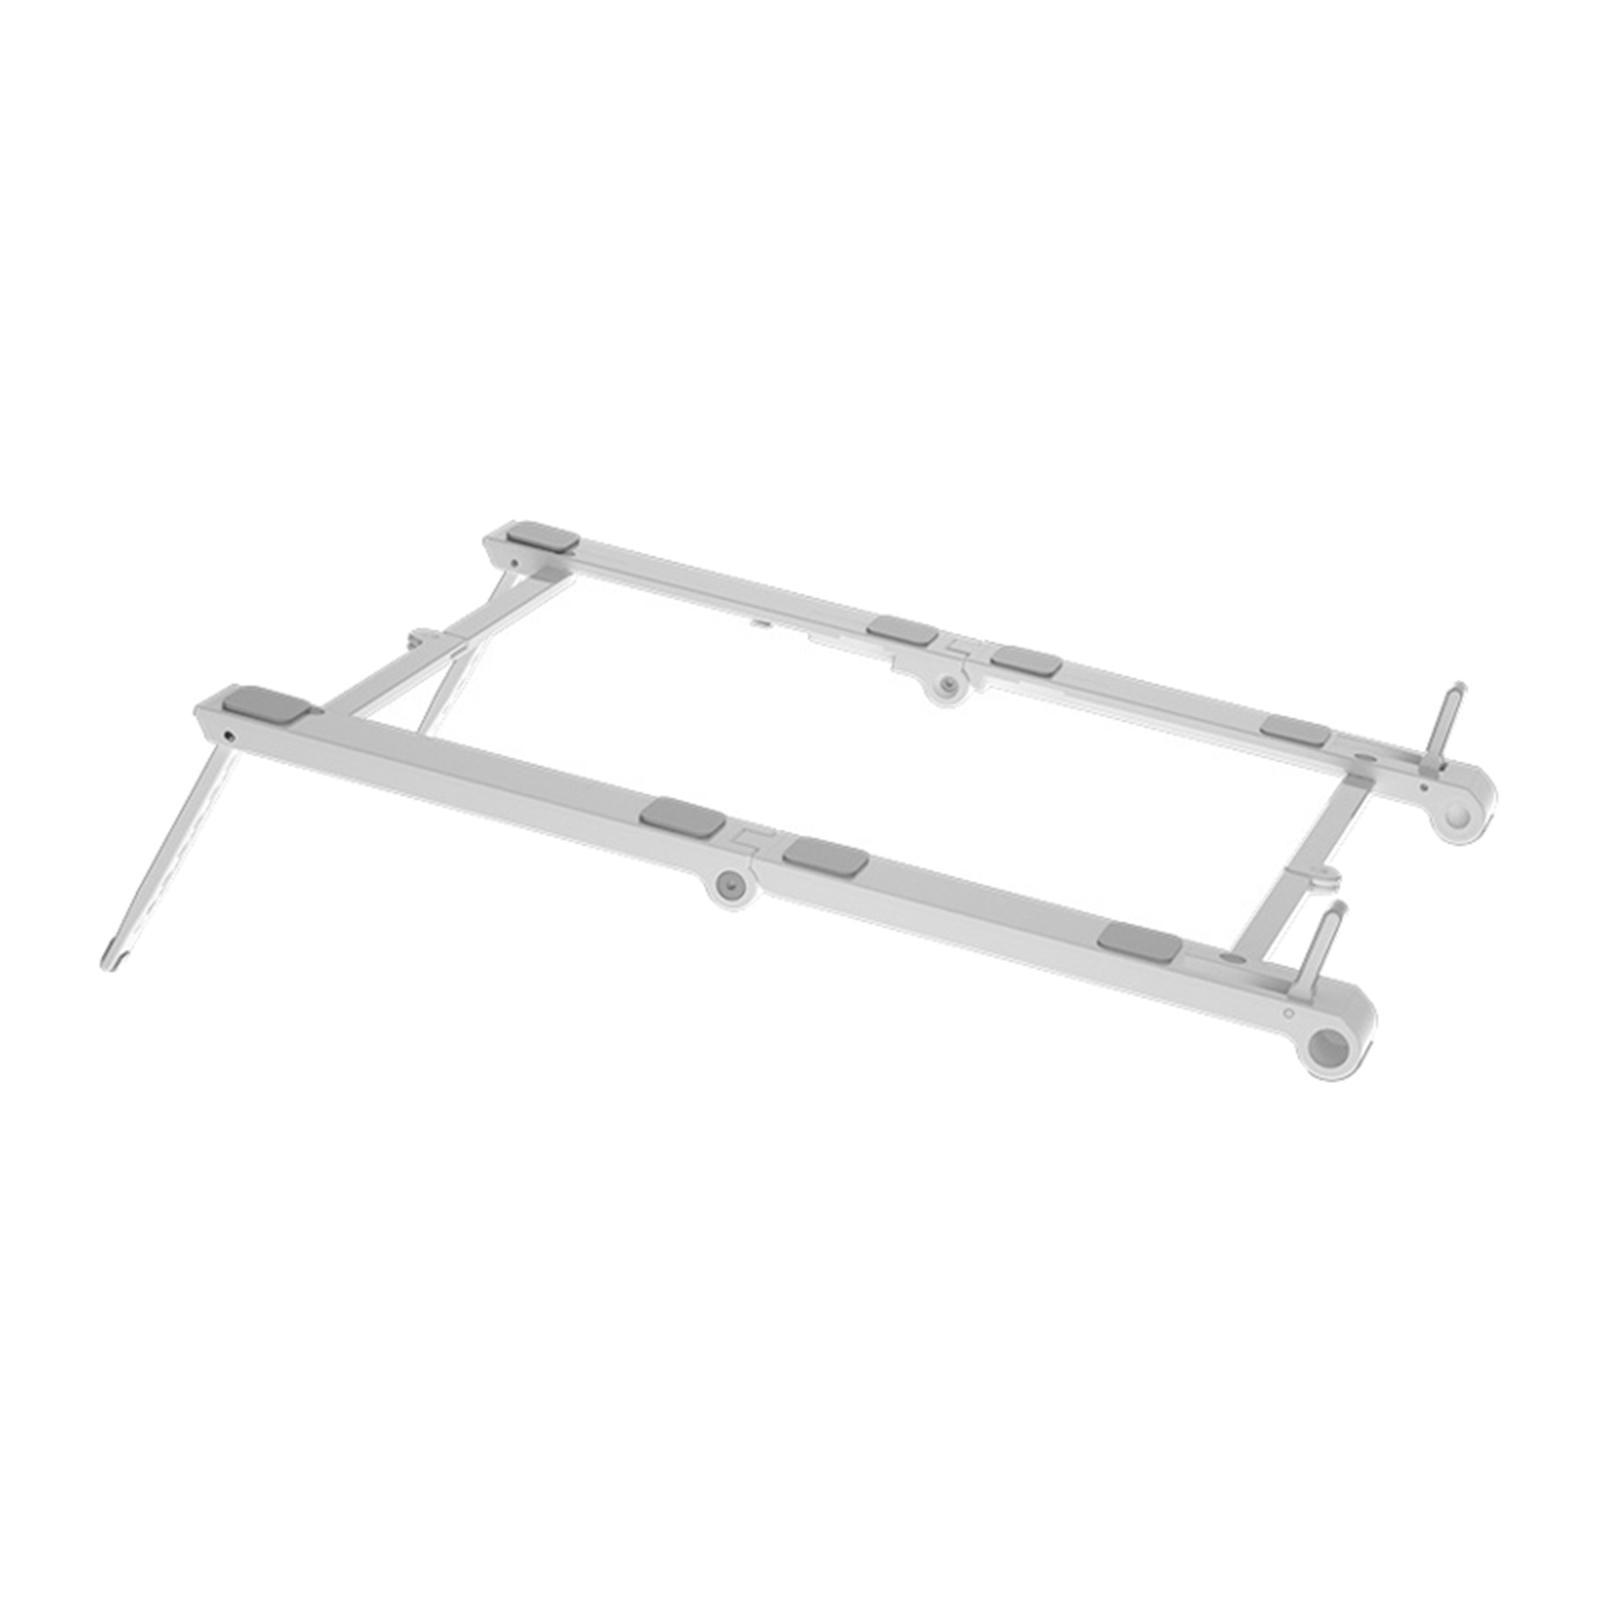 thumbnail 6 - 3 in1 Adjustable Laptop Stand Ergonomic Folding Hollow Radiating for Bracket